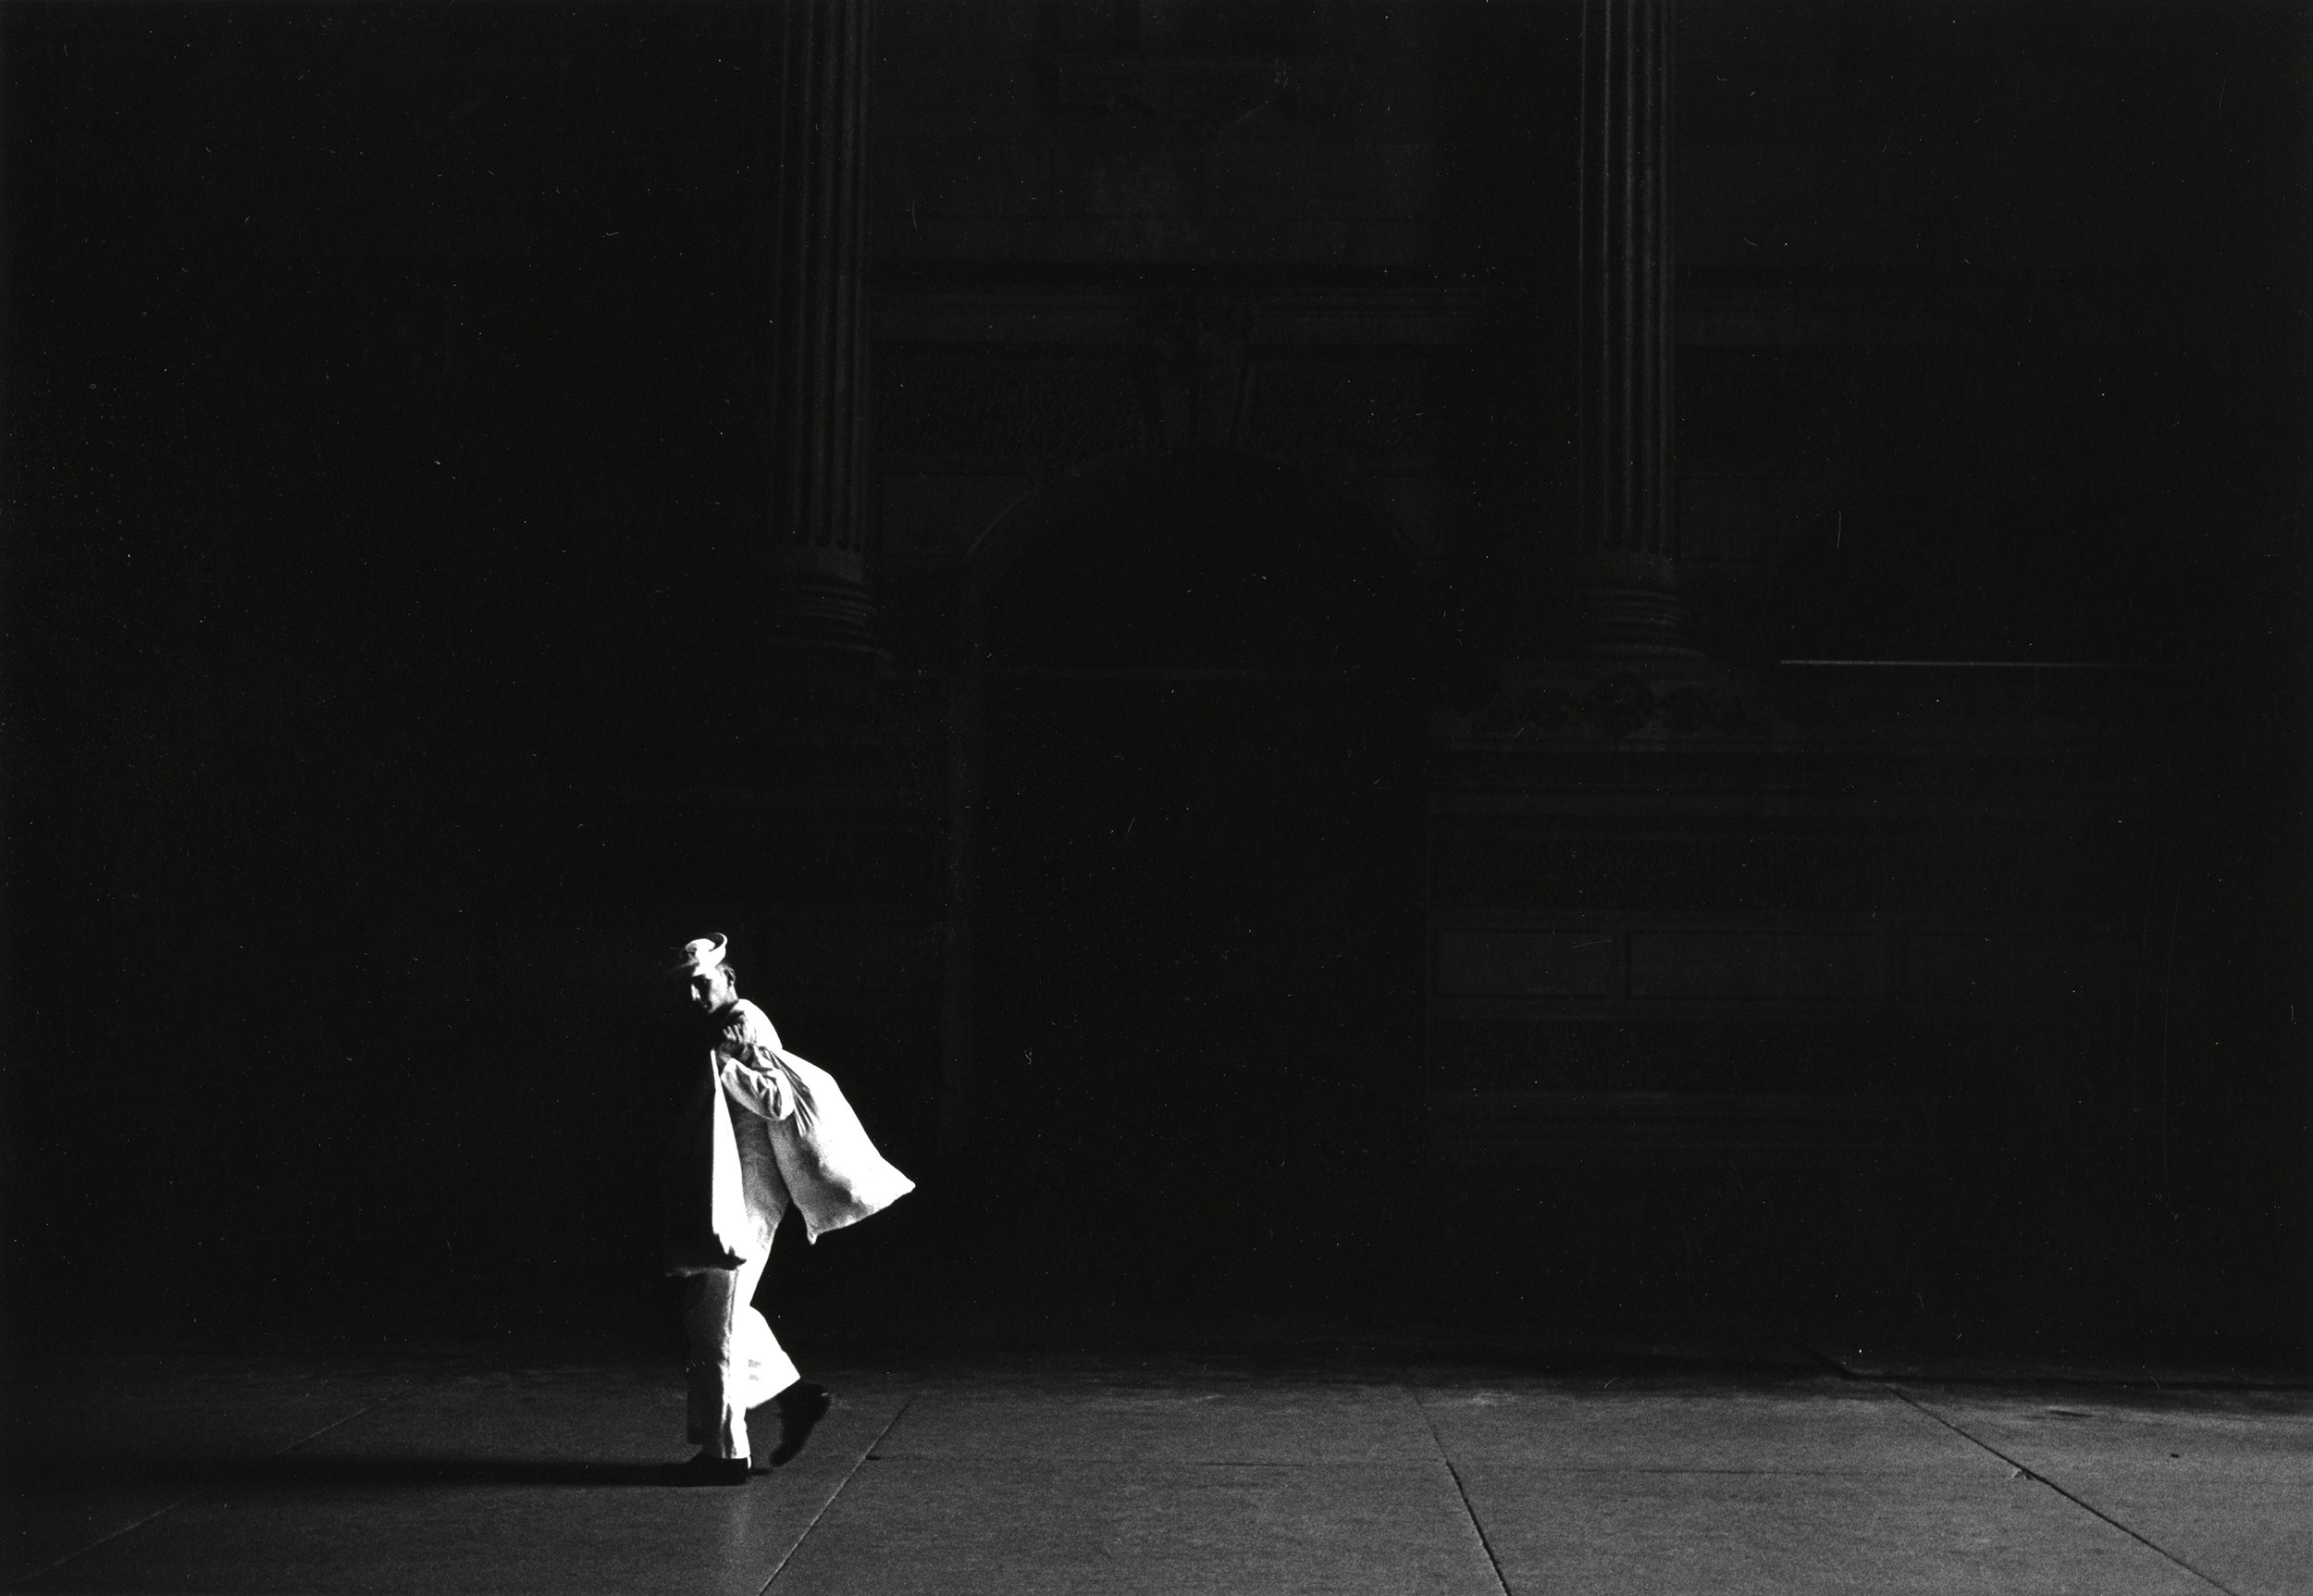 - Philadelphia, 1963Ray MetzkerLoaned to the Nasher Museum of Art at Duke UniversityDurham, North Carolina, 2013